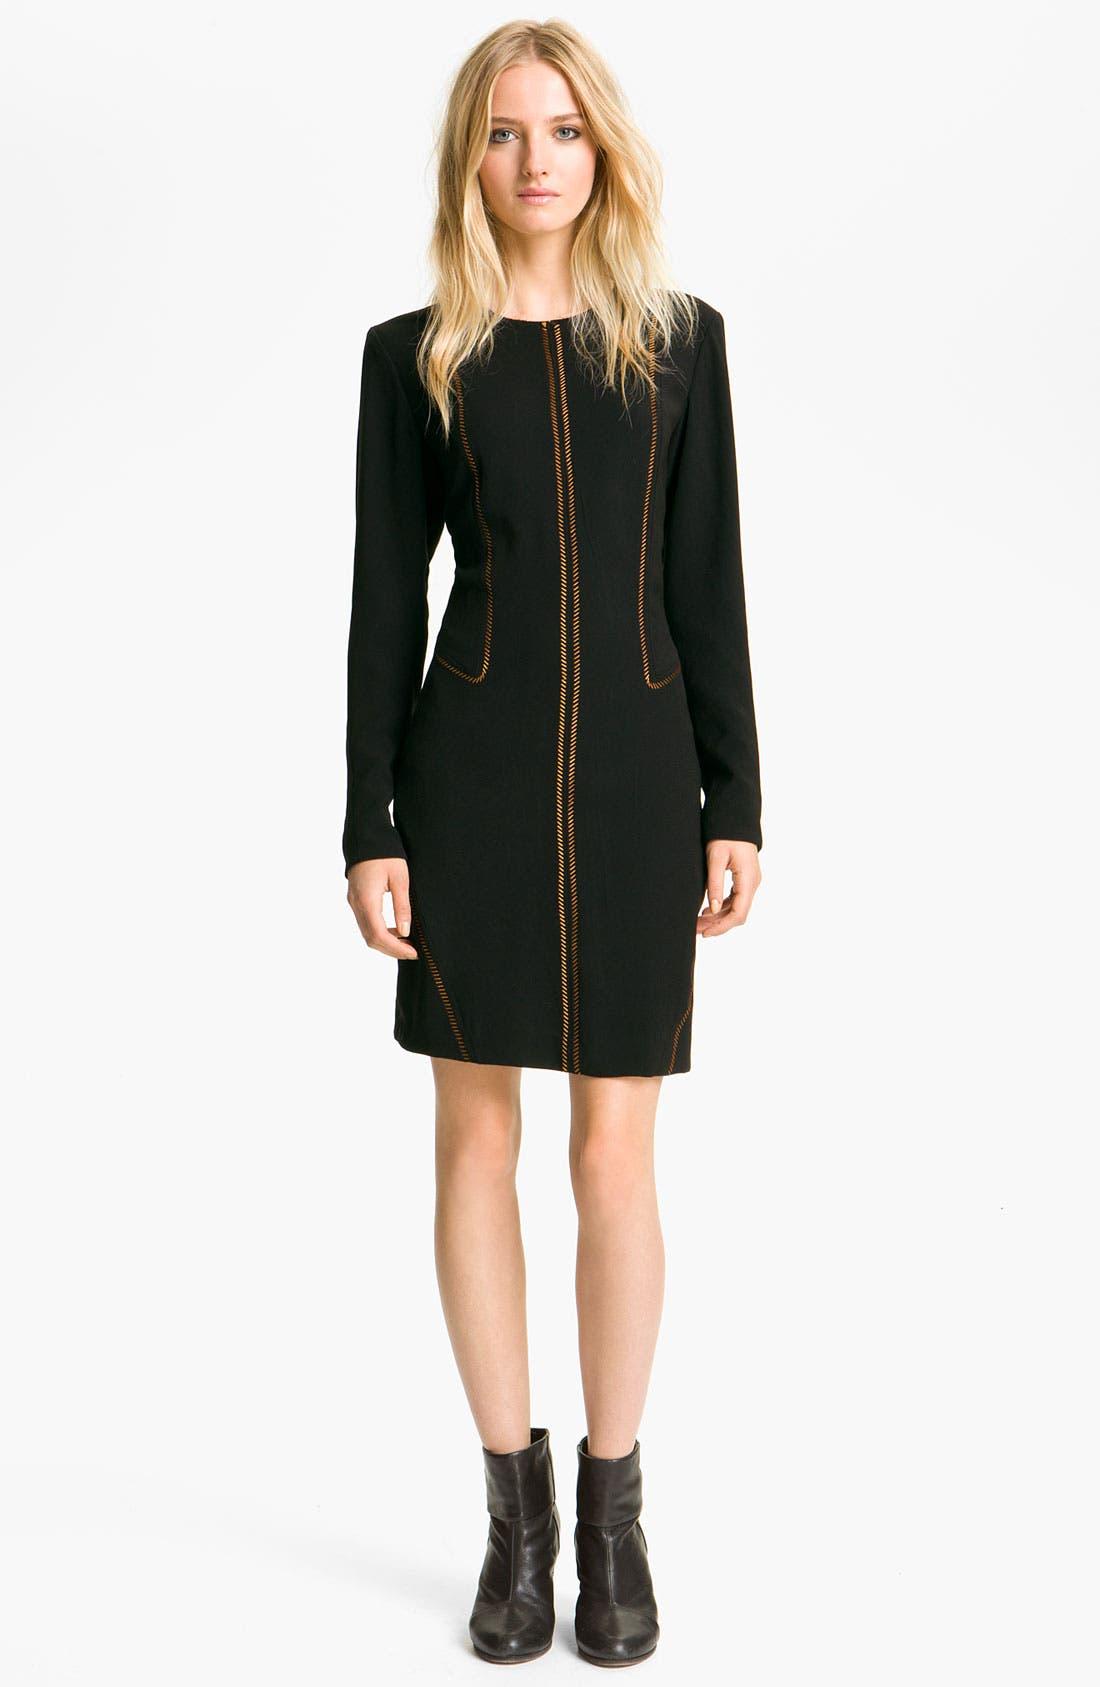 Alternate Image 1 Selected - rag & bone 'Raj' Metallic Seam Dress